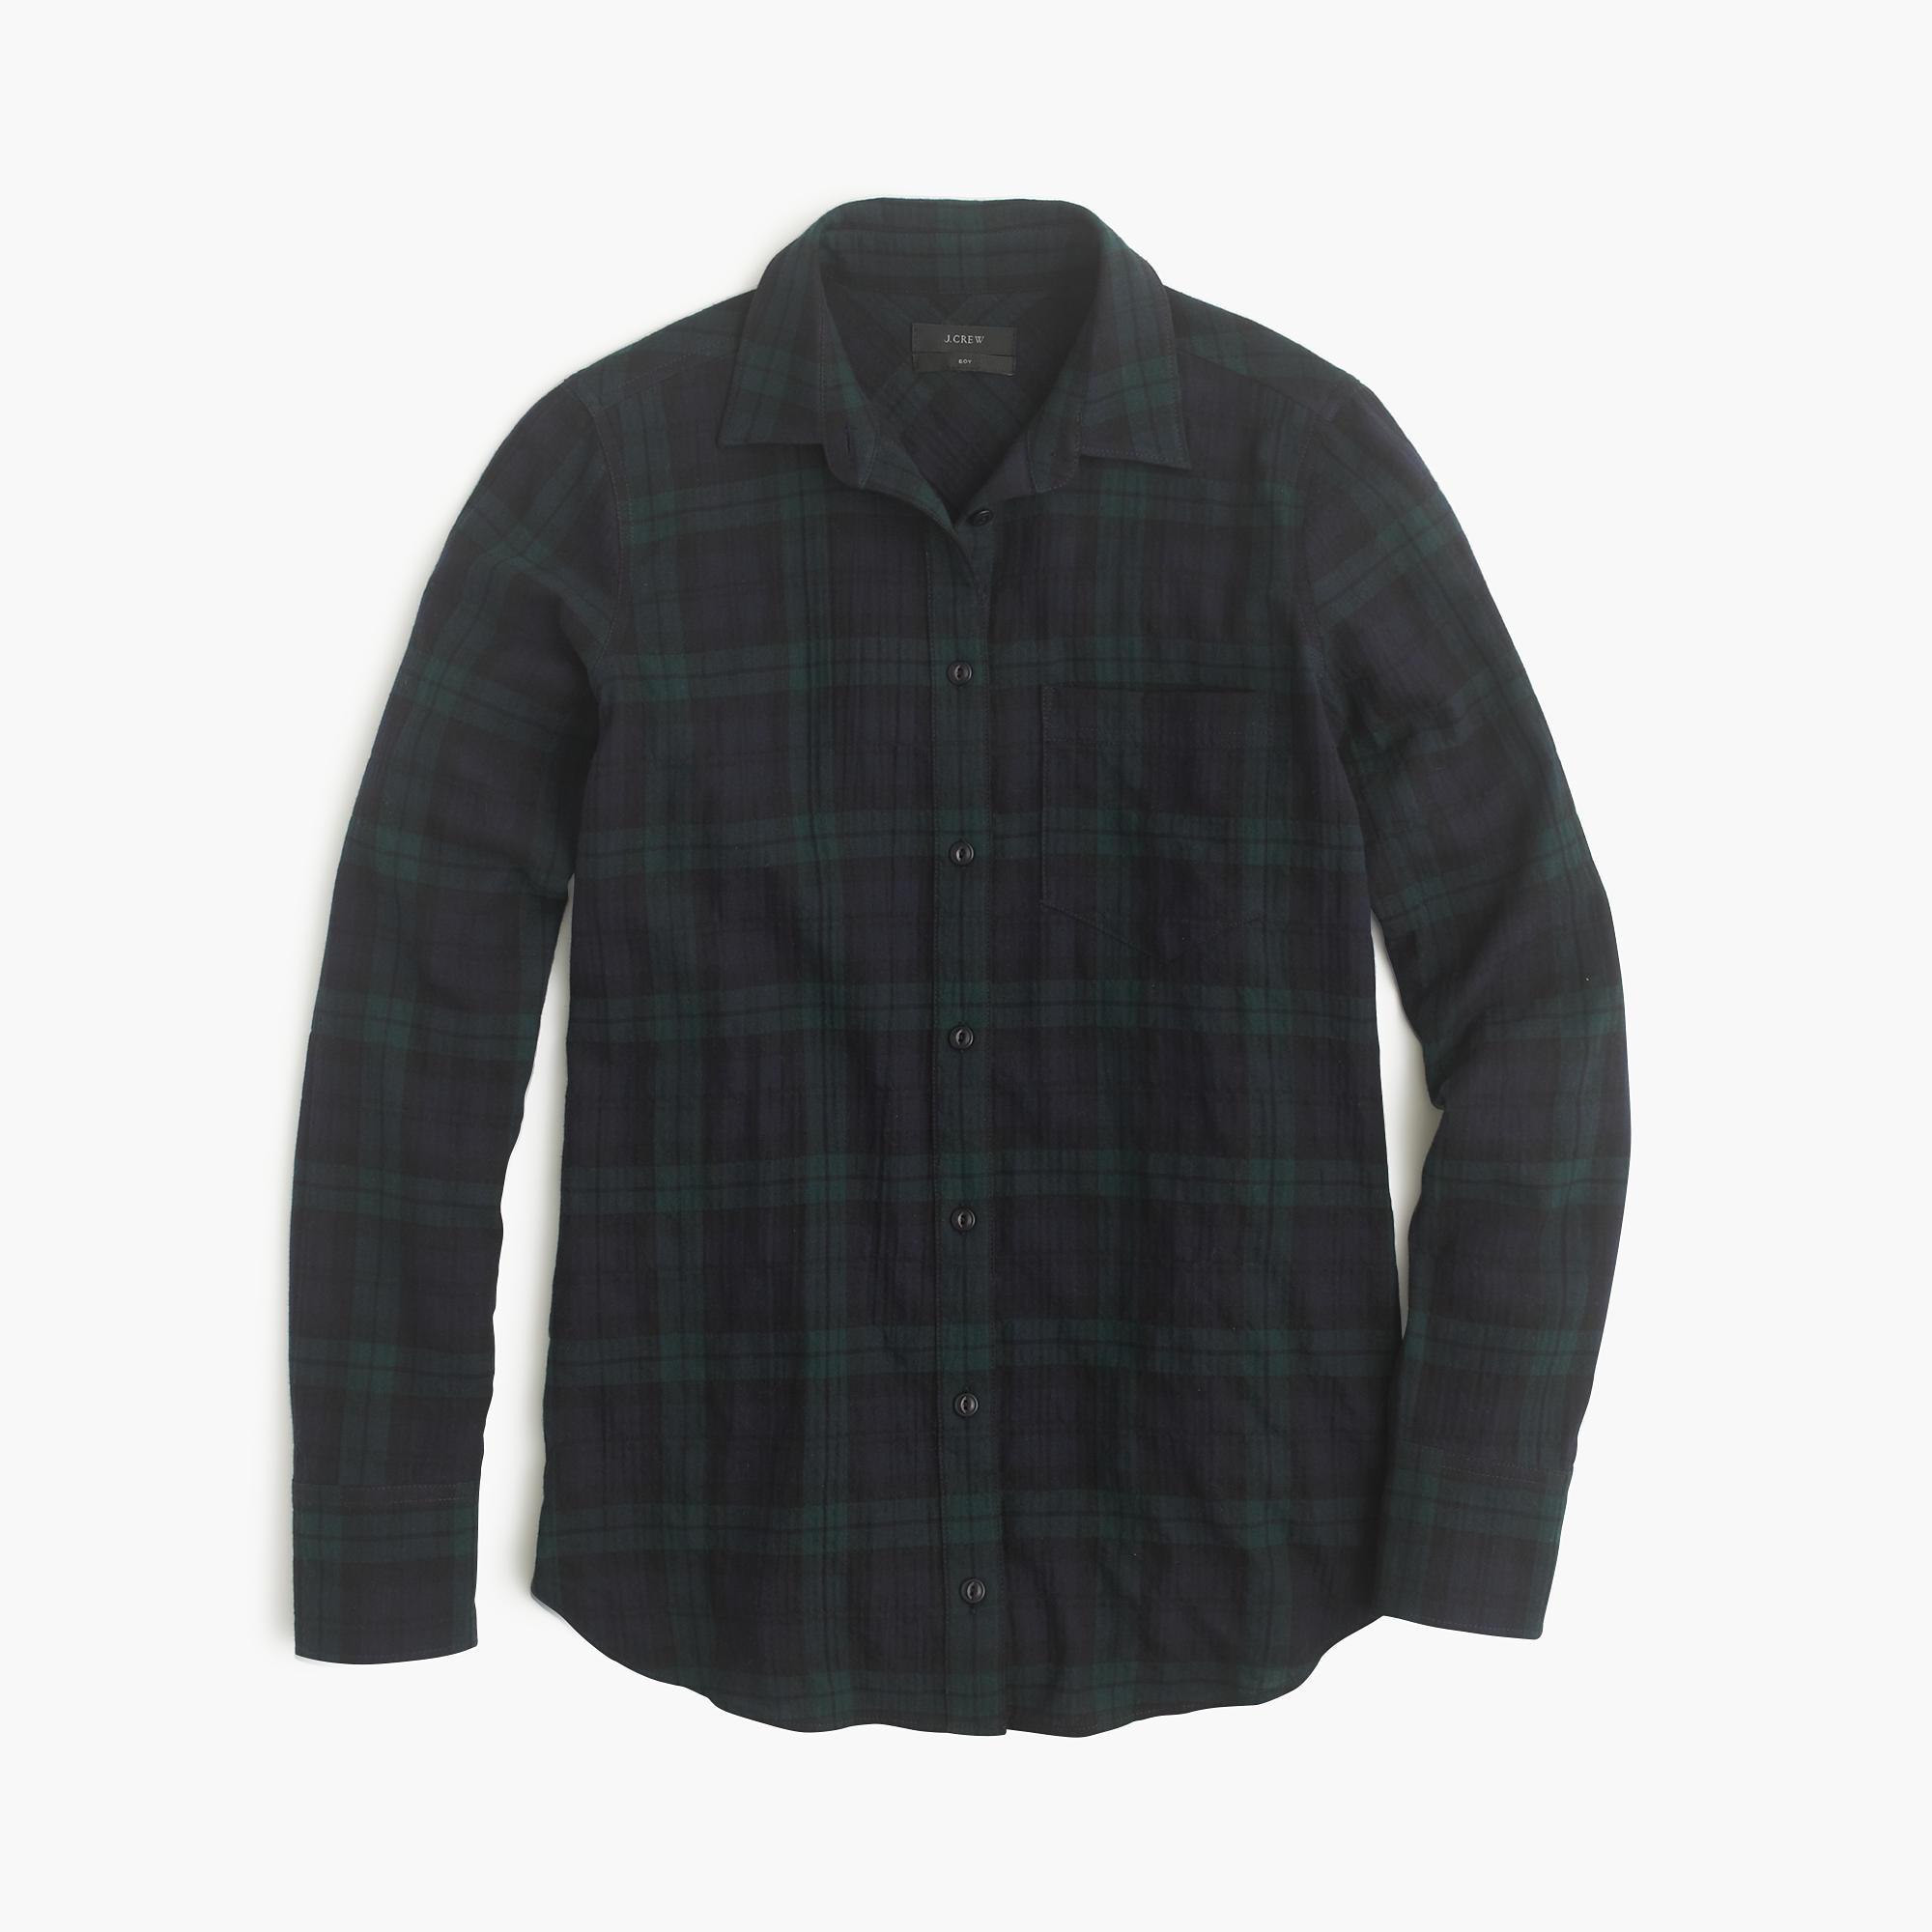 Boy shirt in black watch flannel for men lyst for Black watch flannel shirt